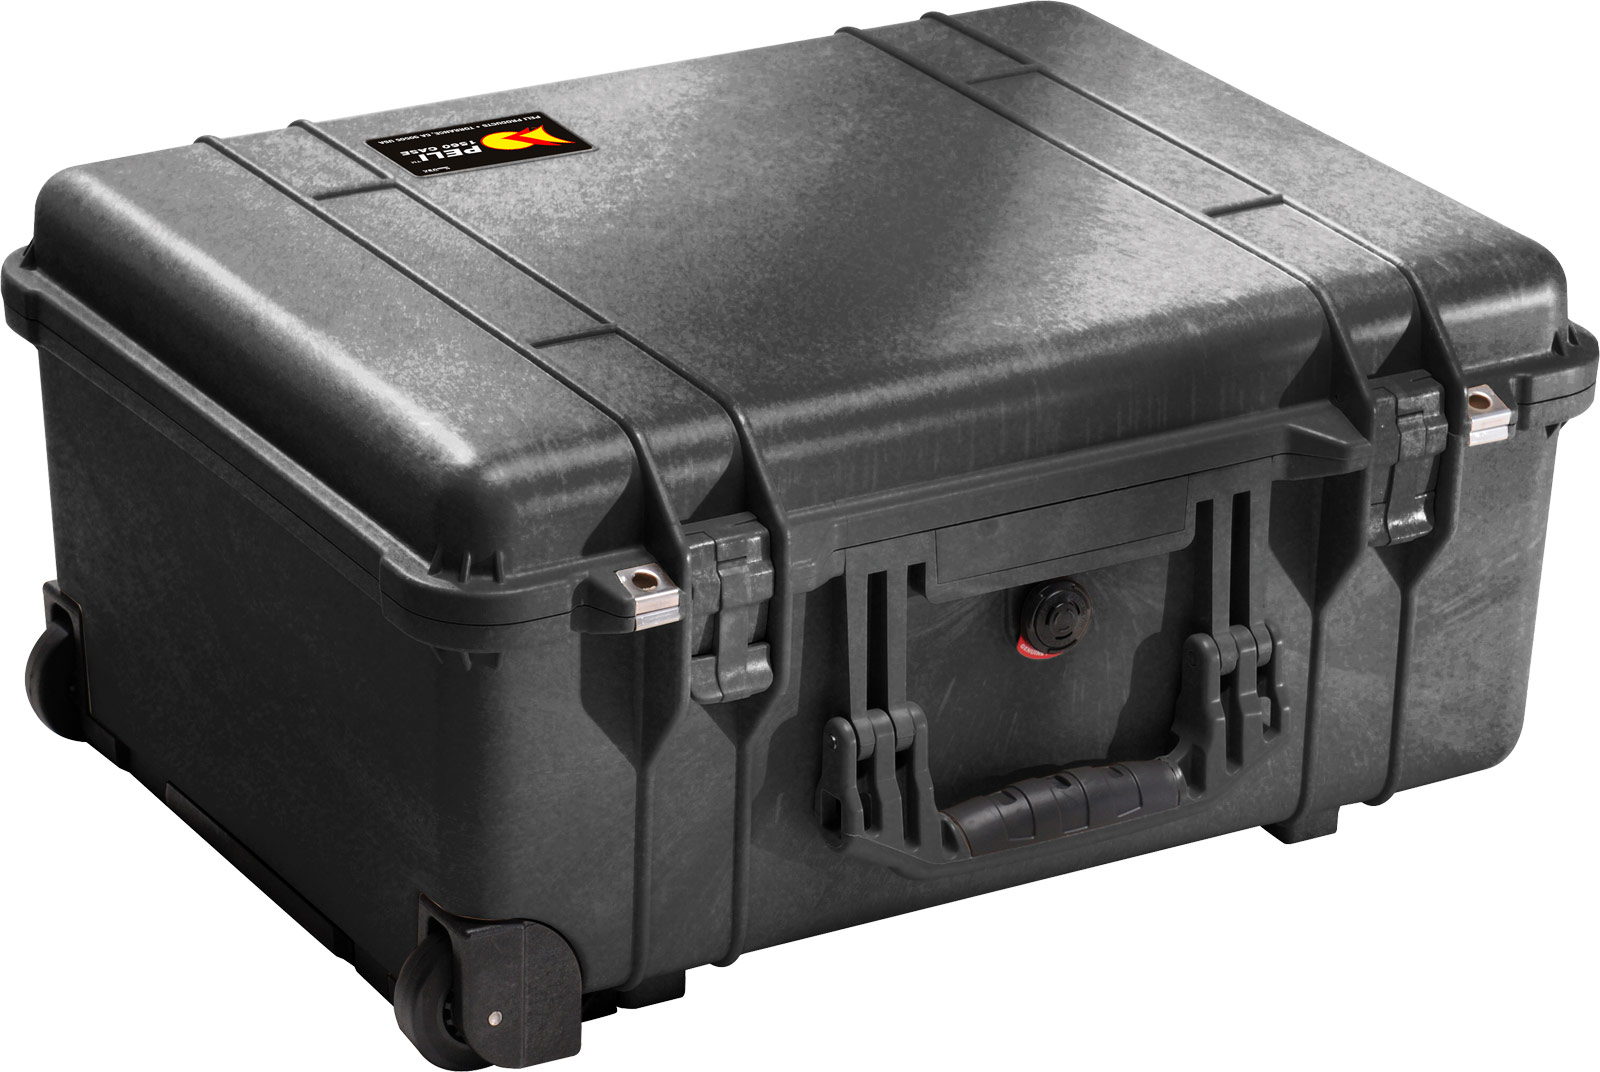 peli protector 1560 hard rolling case